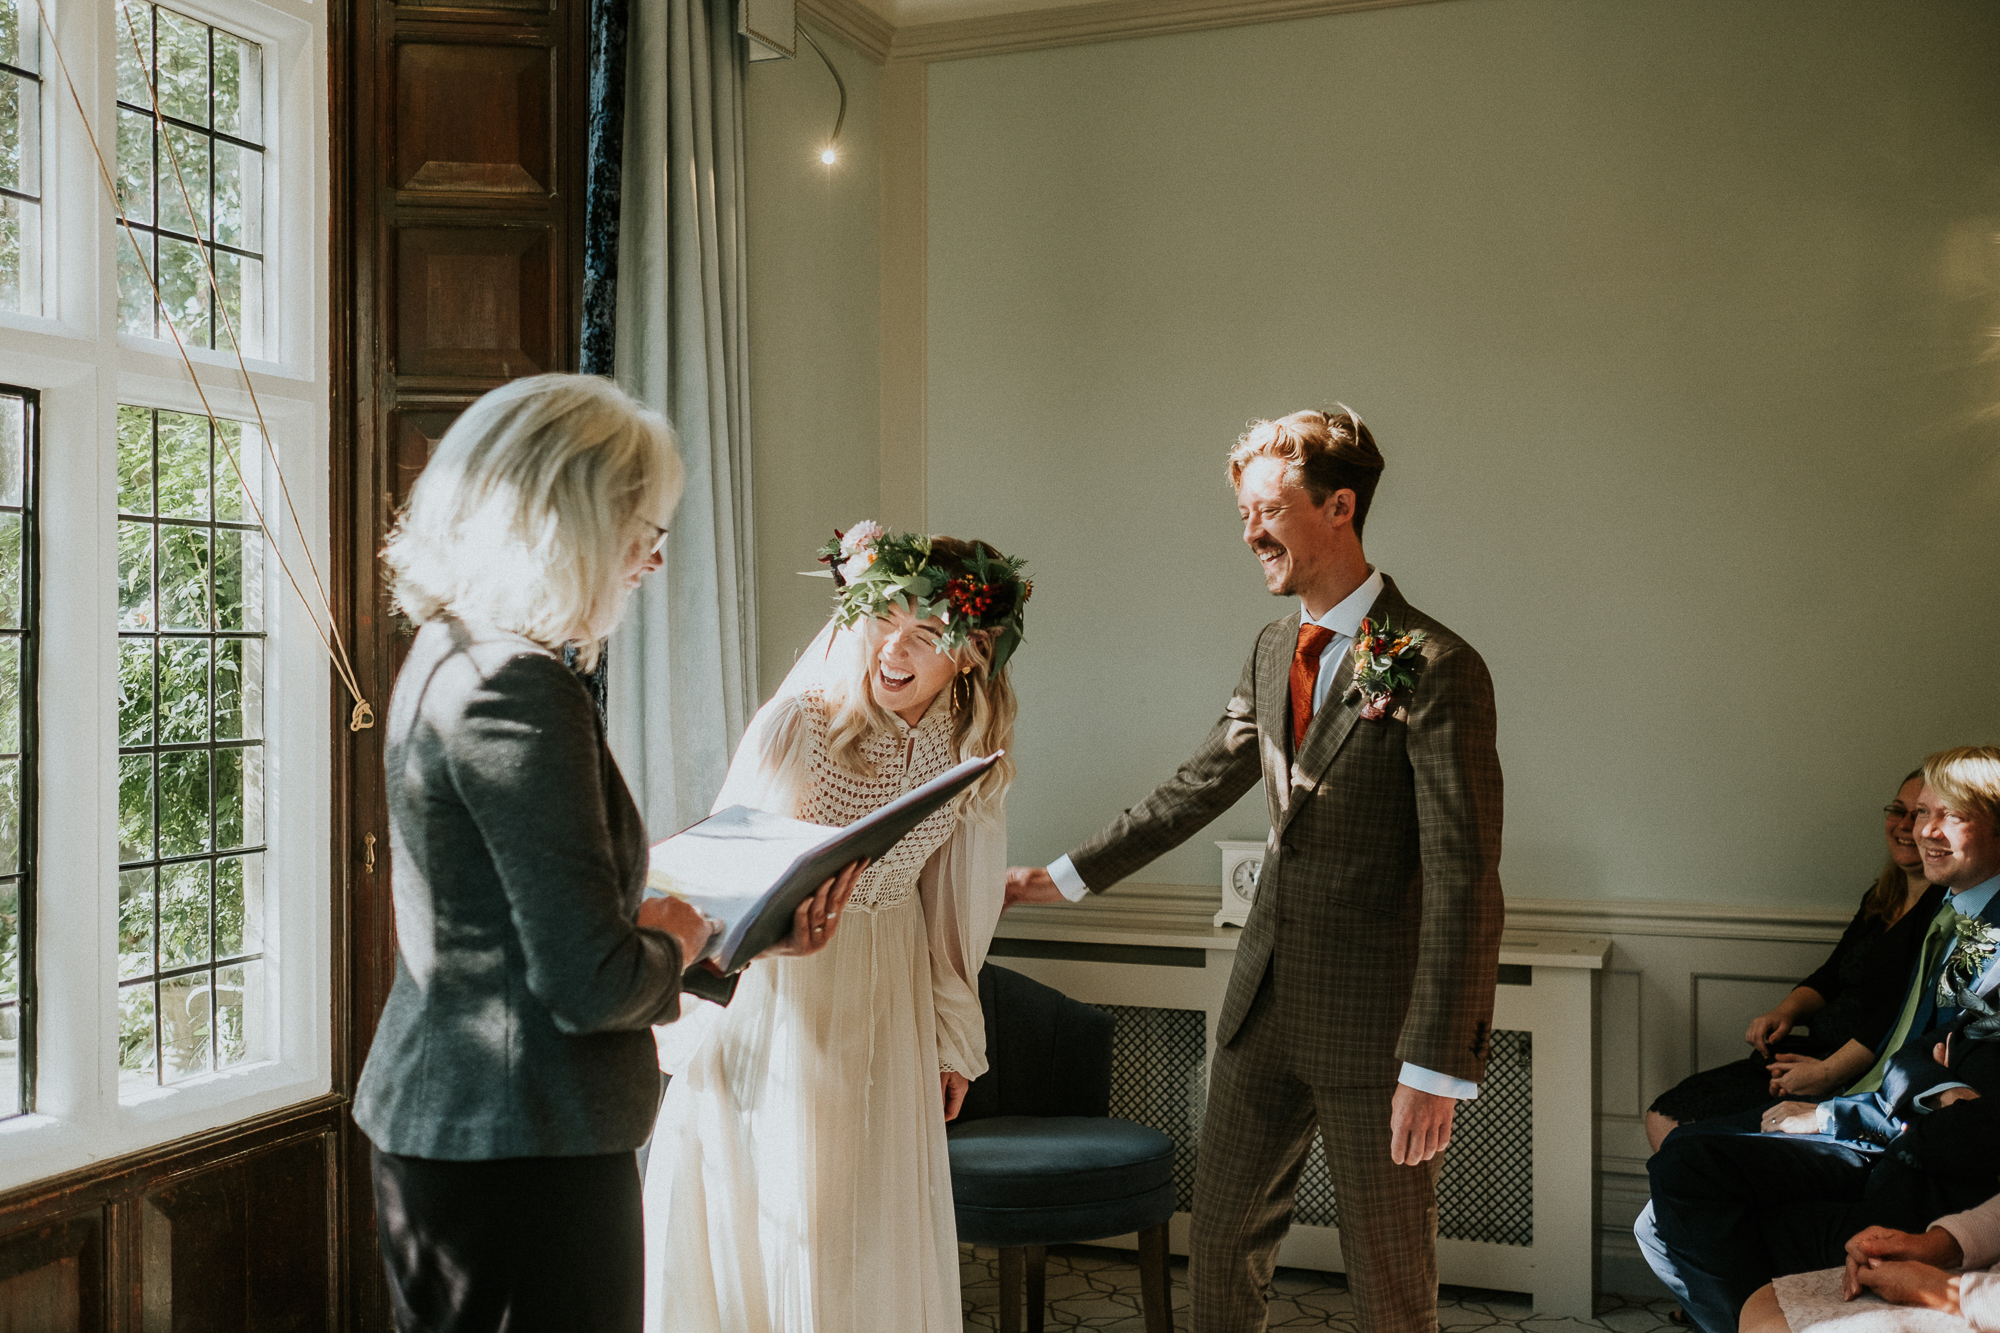 100 Cuckmere Haven Engagement shoot alternative wedding photographer Joanna Nicole Photography2.jpg